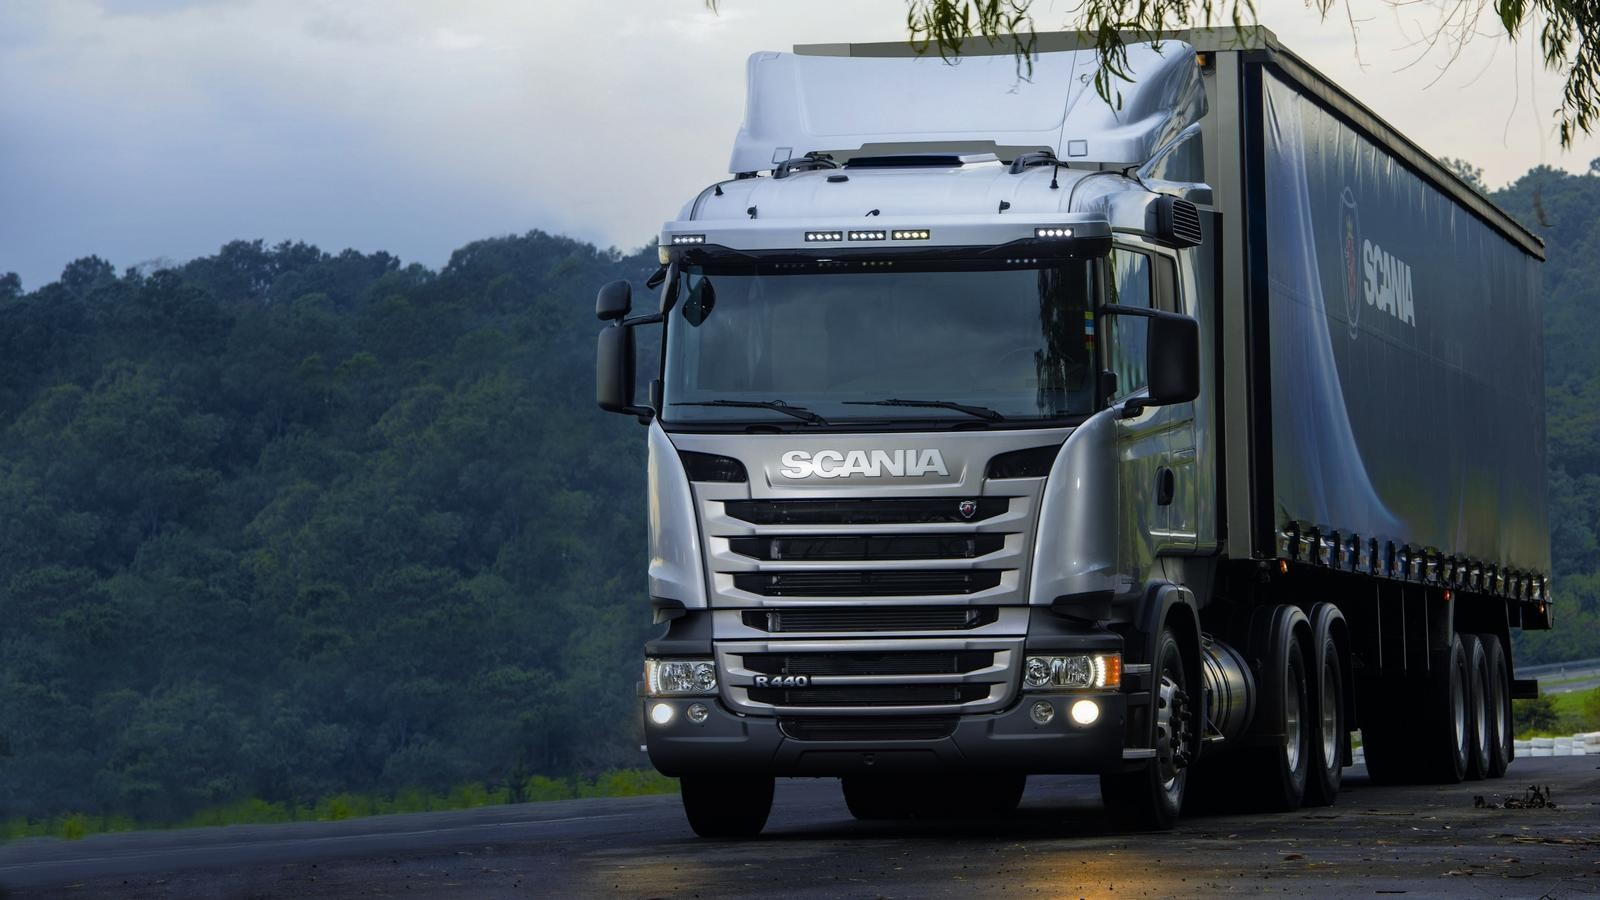 Scania. Ремонт 2-х опорного карданного вала